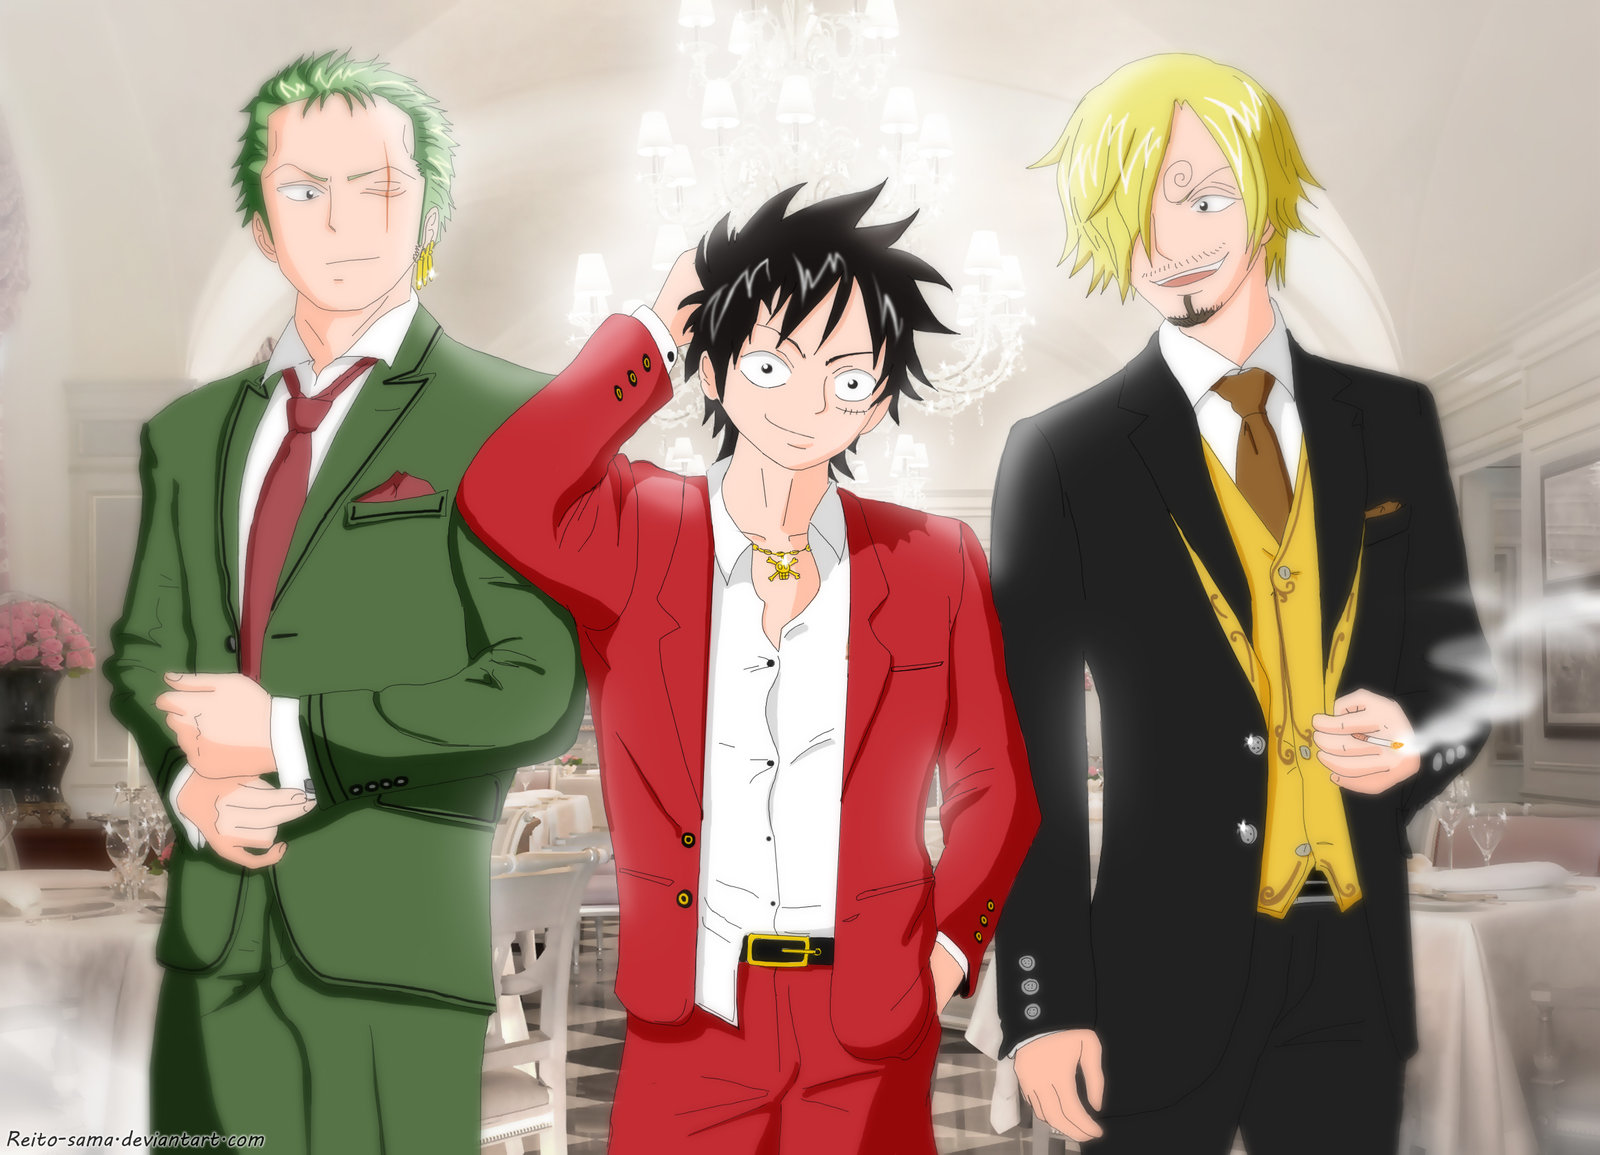 Biodata Lengkap Luffy, Zoro And Sanji One Piece | Jerz  One